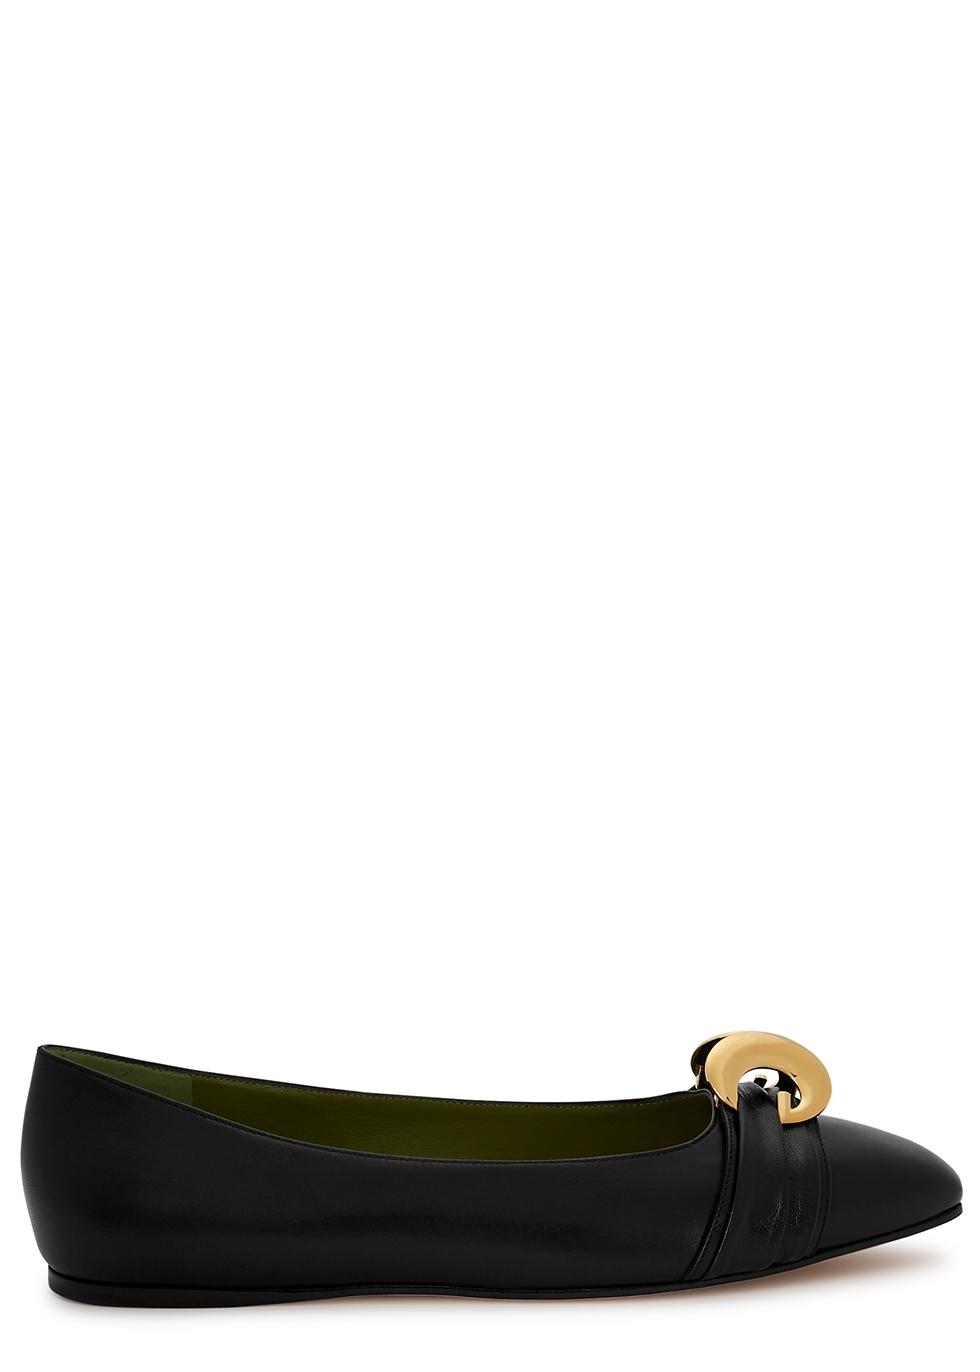 3ba04924f6e0 Women s Designer Flats - Flat Shoes - Harvey Nichols